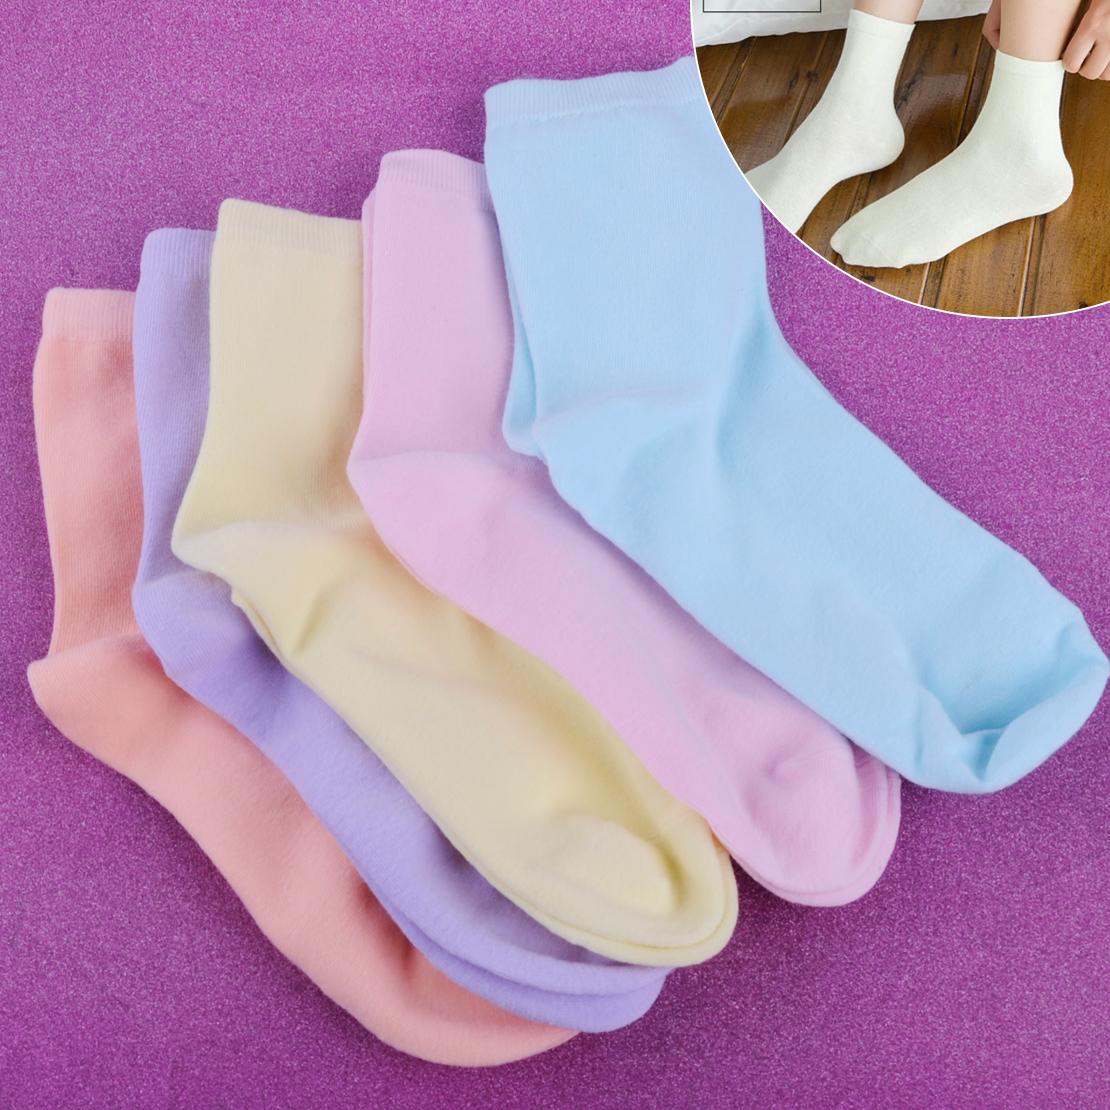 5 Paar Damen Baumwollsocken Mädchen Solid Kuschel Bunte Weiche Socken Girl Socks